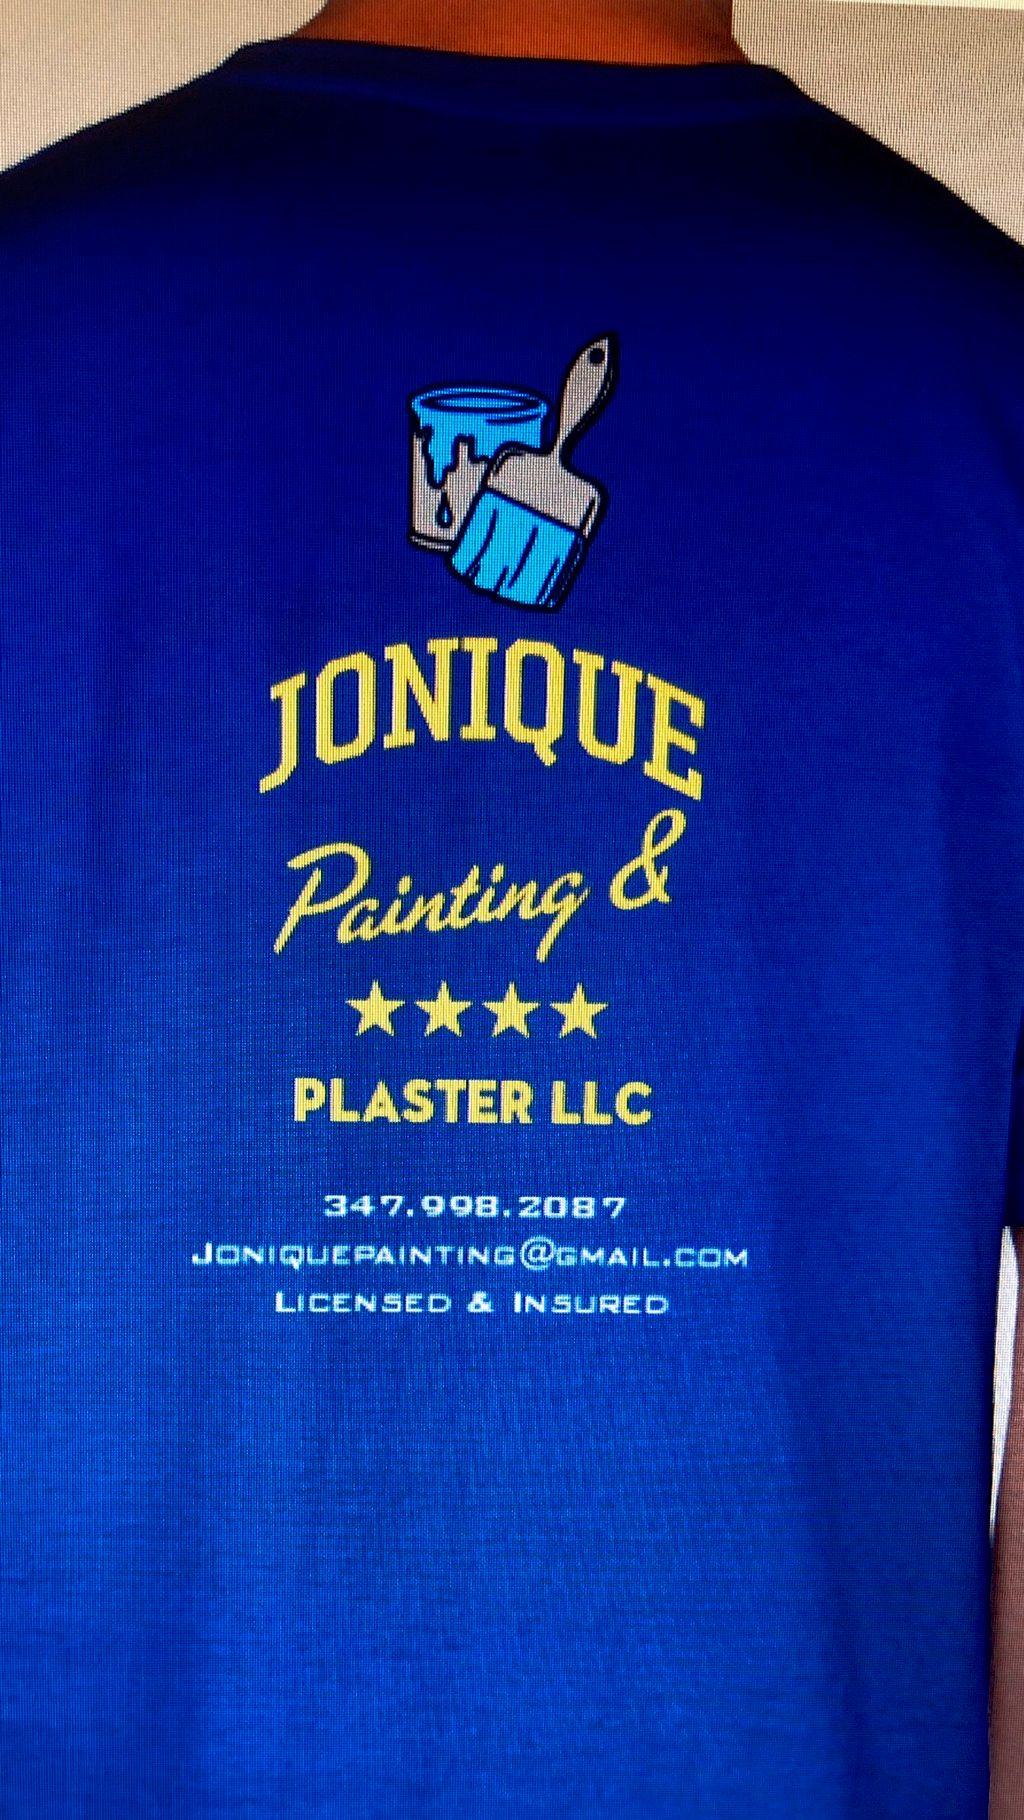 JONIQUE- Painting & Plaster LLC